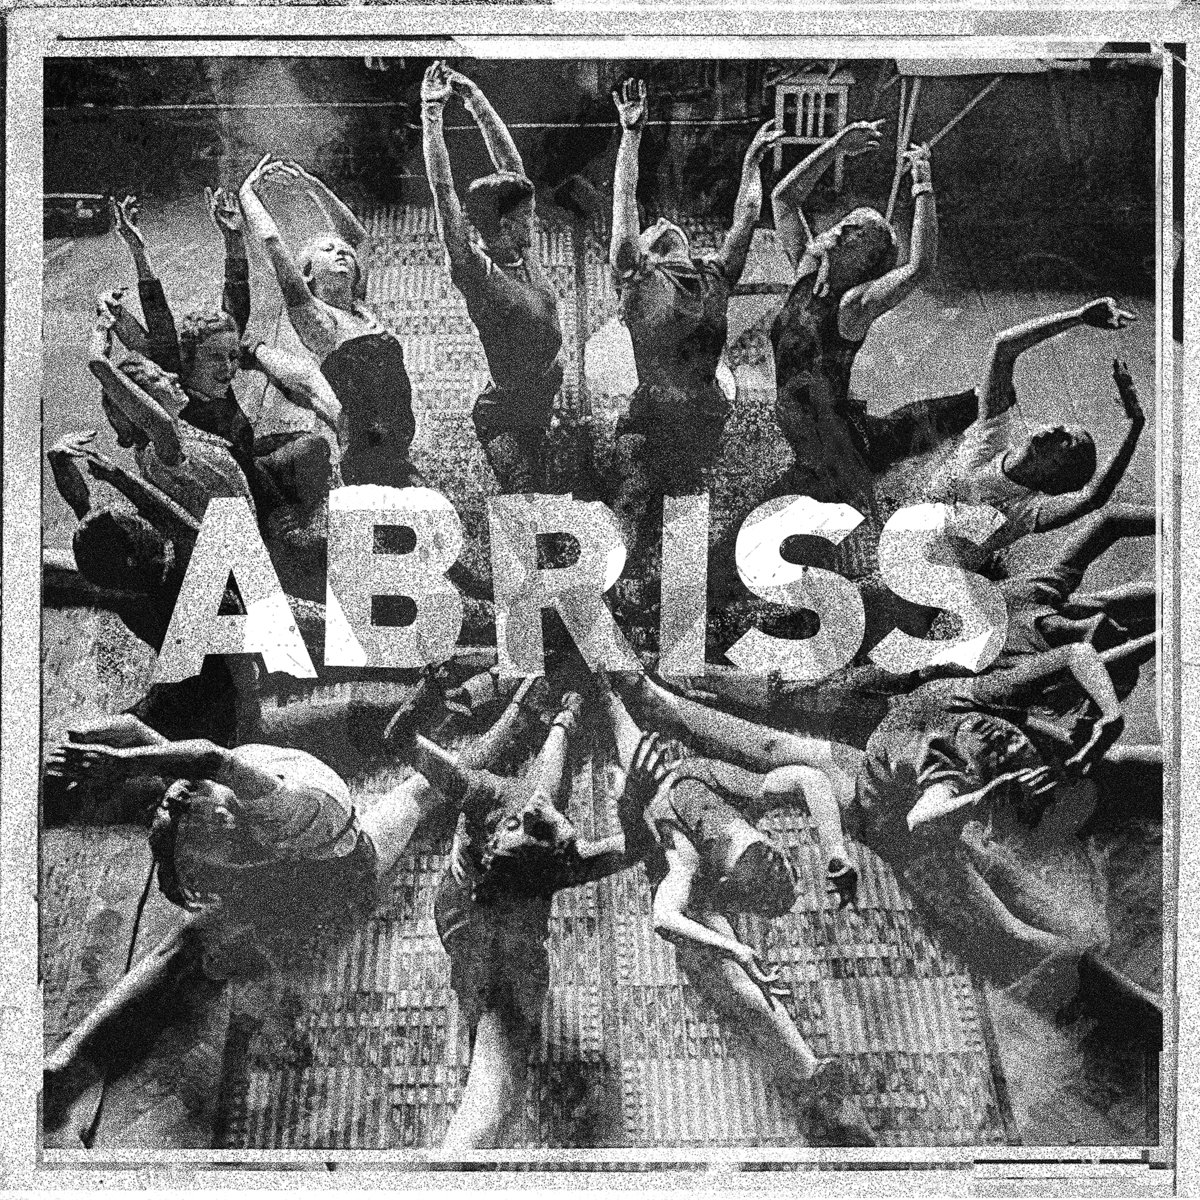 ABRISS